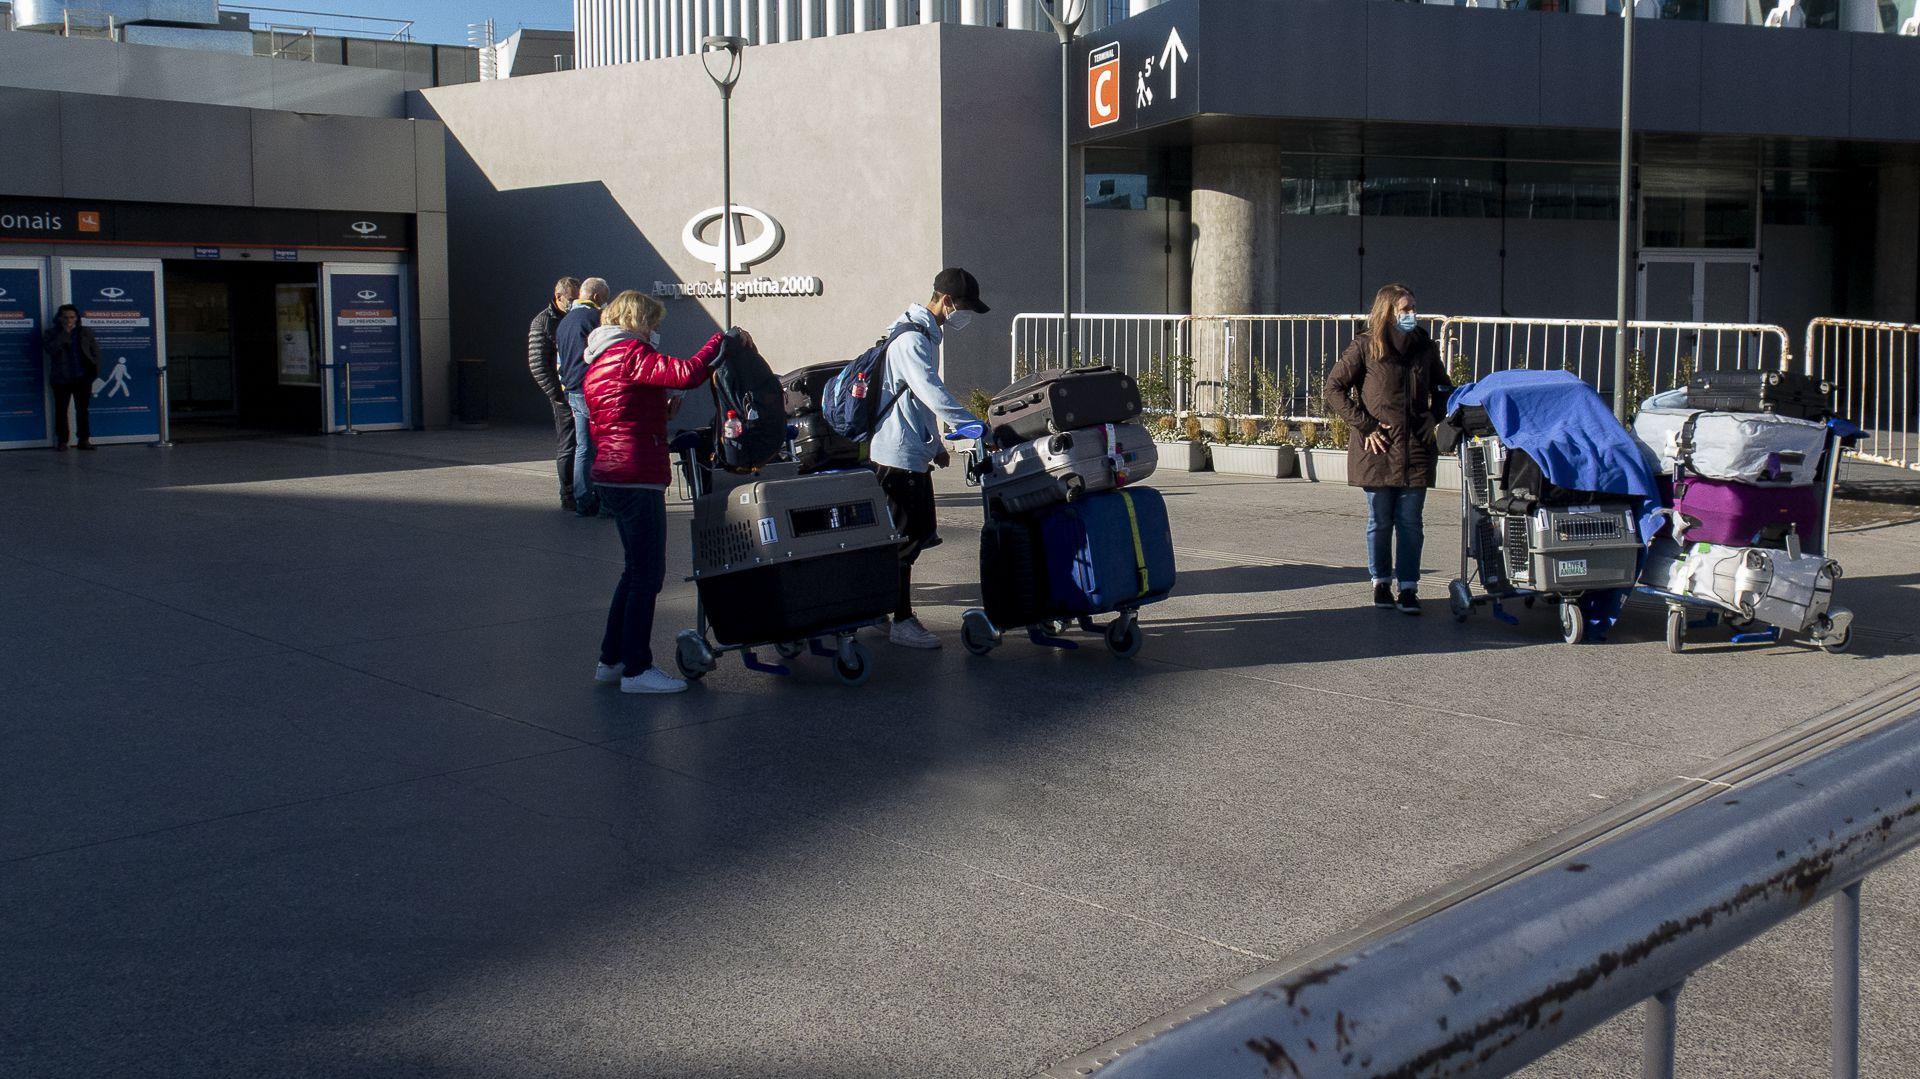 Aeropuerto Ezeiza - Aeropuertos Argentina 2000 - Protocolo -Partidas - Arribos - Stamboulian - Centro de Testeo - Llegadas - Terminal A - Terminal C - Estacionamiento - Pasajeros - Covid-19 - Check In -Hall Espera -Ingreso -